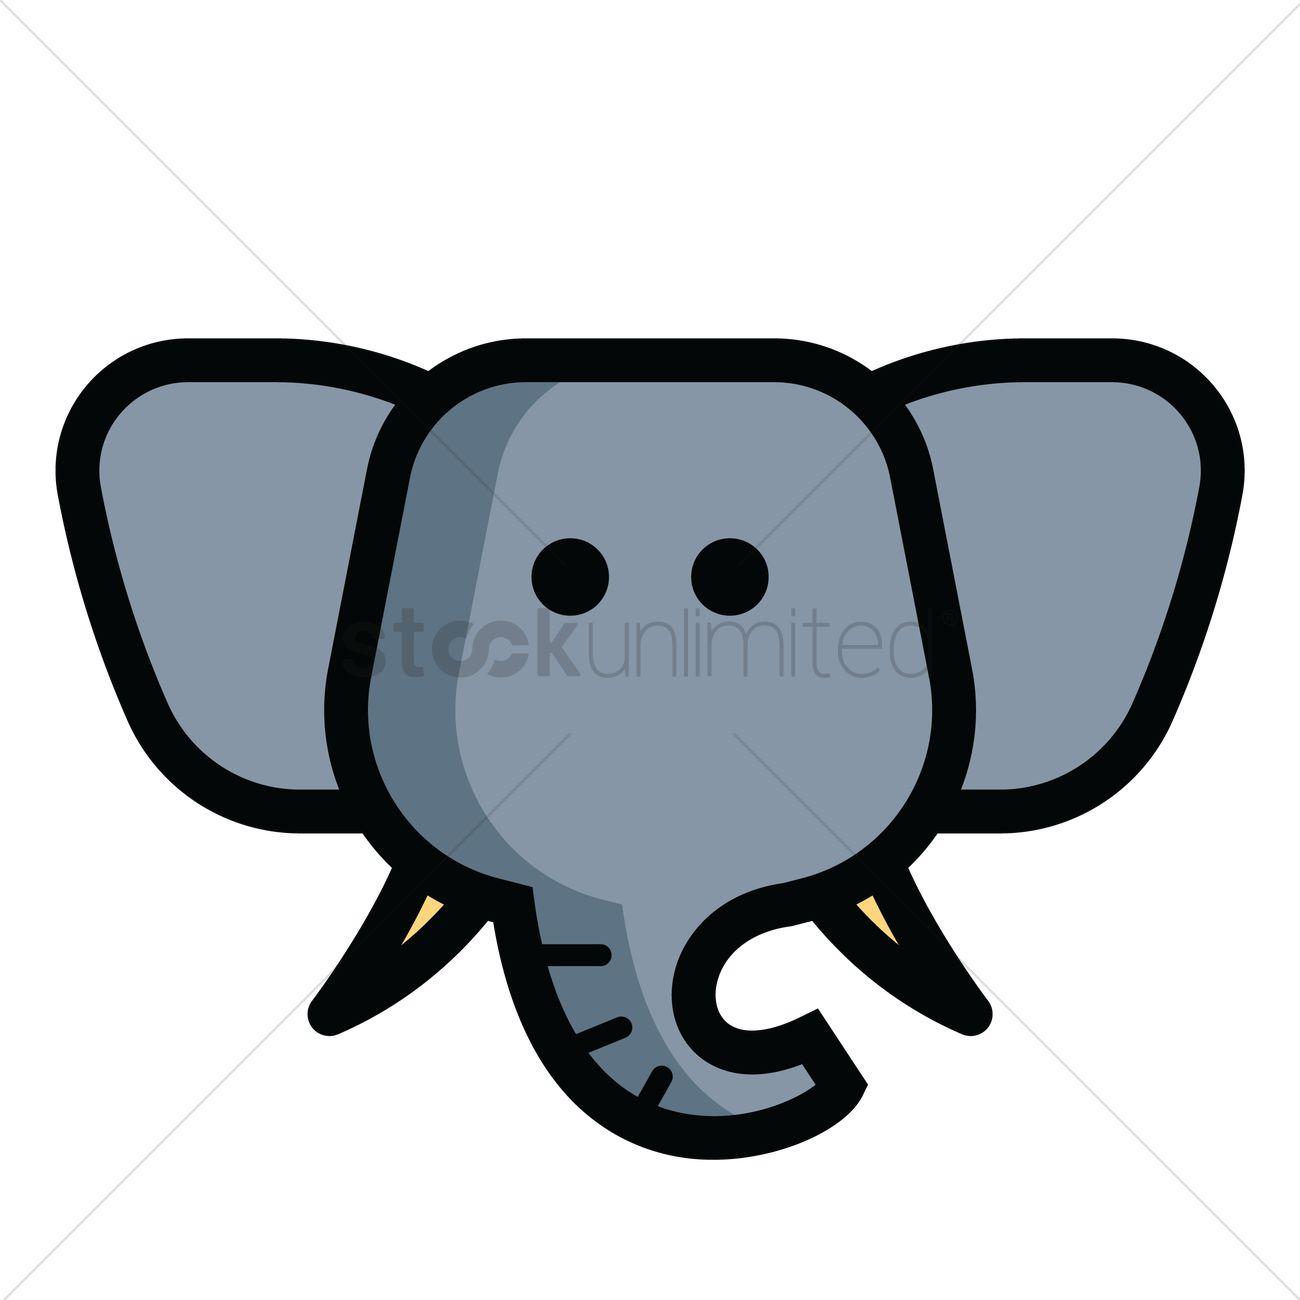 elephant head vector image 1821314 stockunlimited rh stockunlimited com cartoon elephant head images cartoon elephant head outline